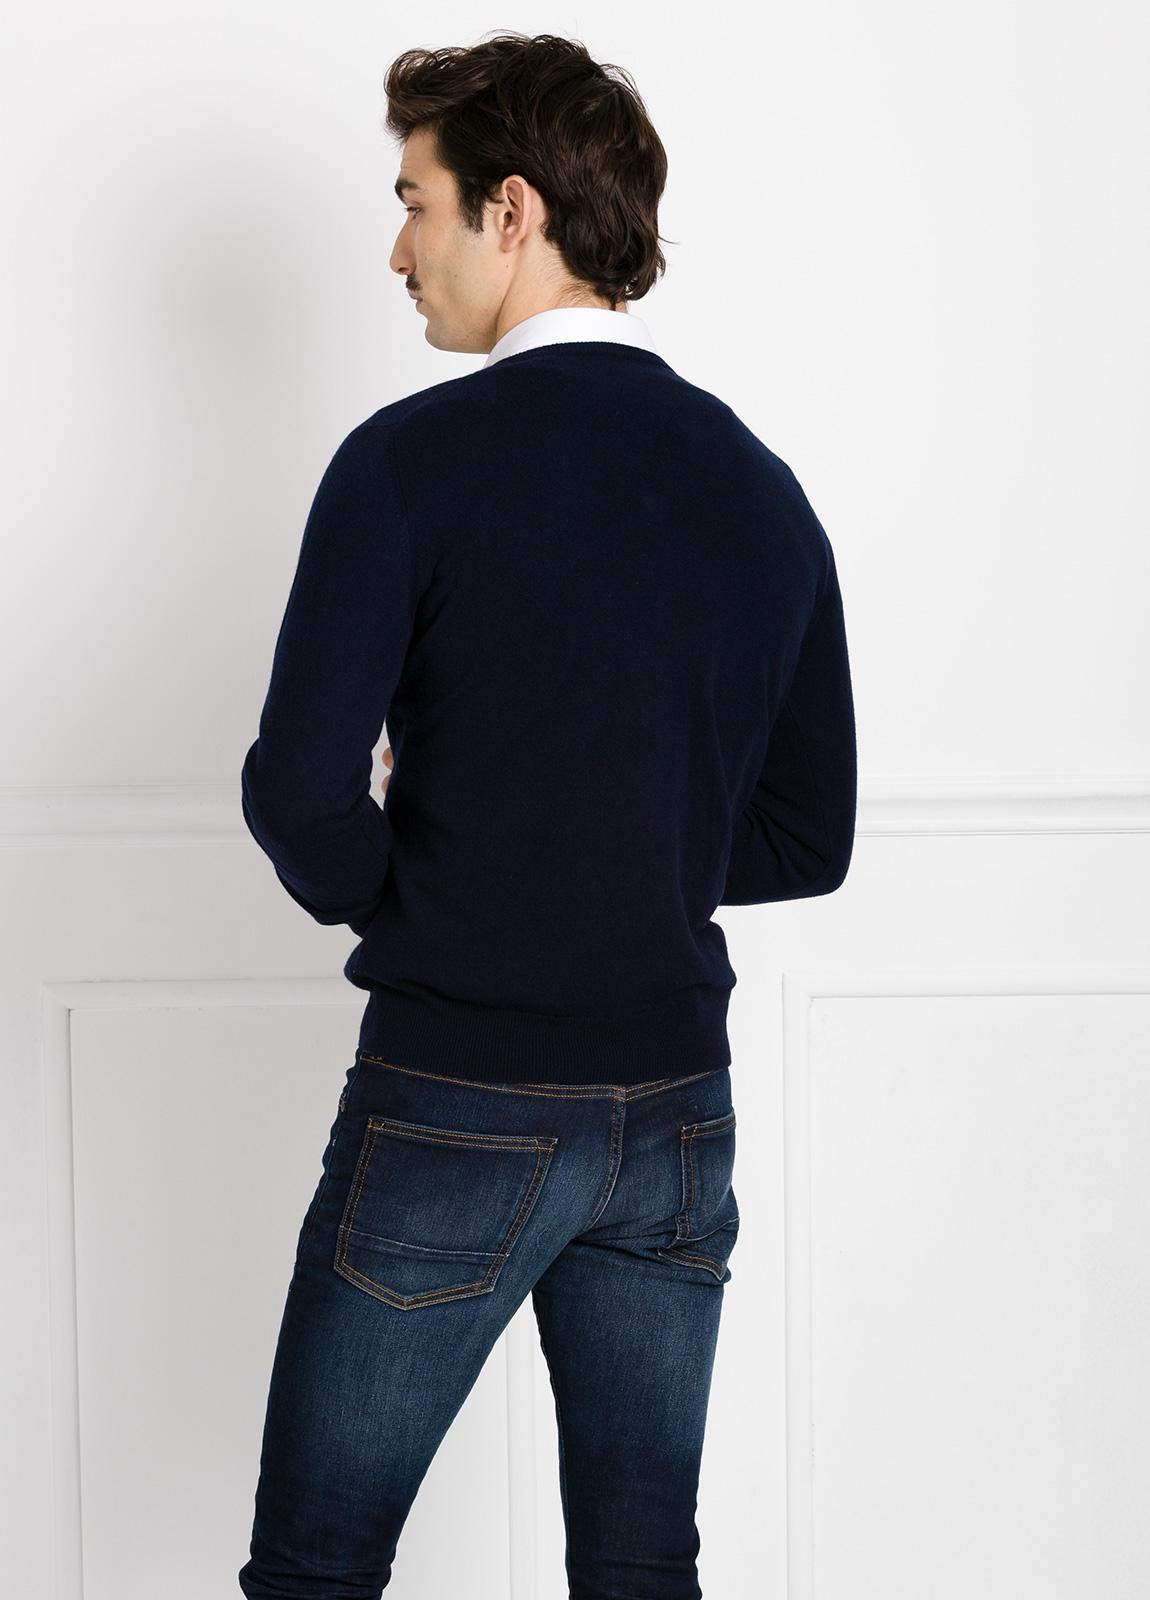 Jersey liso cuello pico color marino, cashmere 100%. - Ítem1